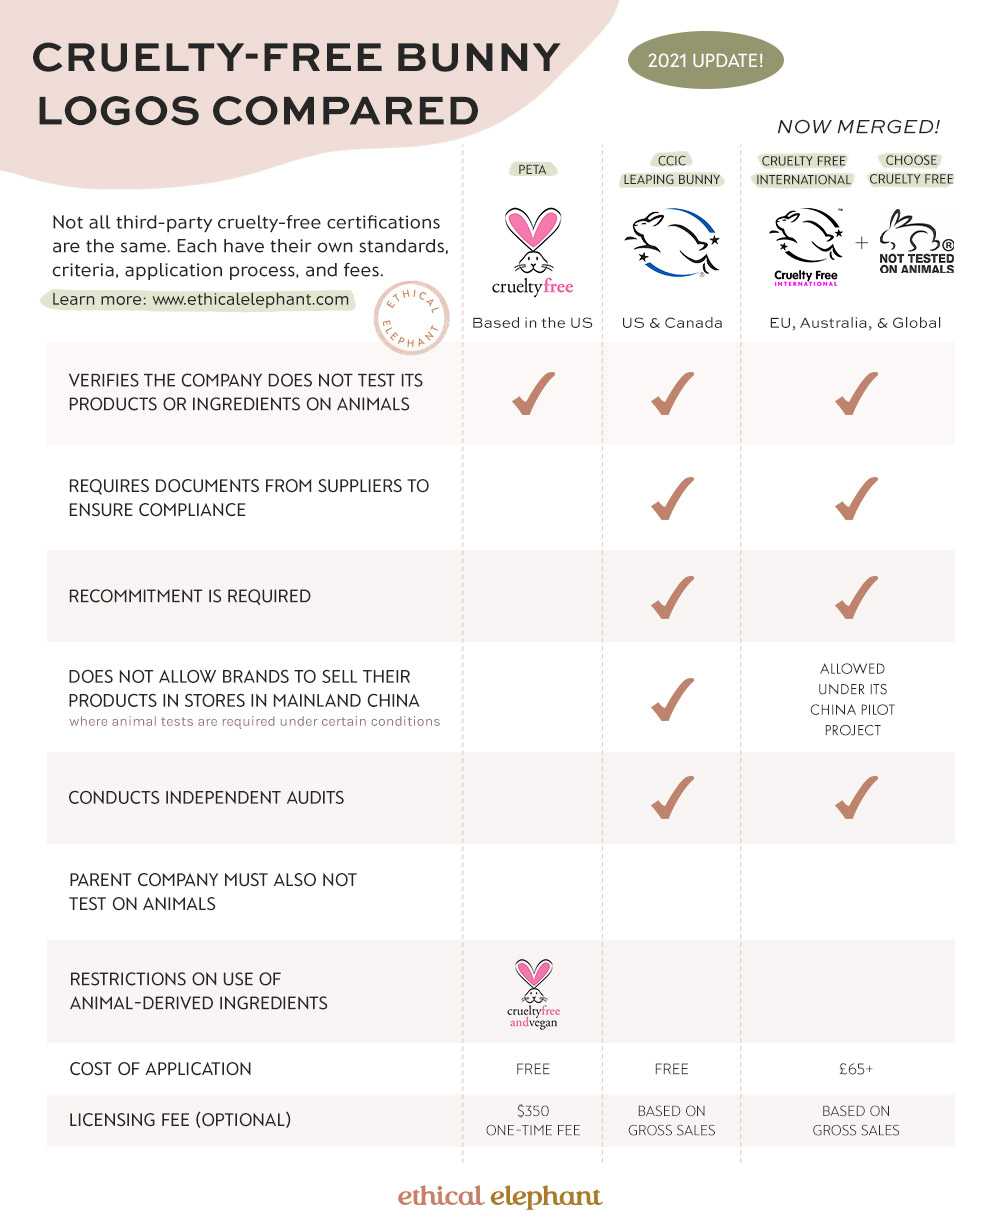 Cruelty-Free Bunny Logos Compared